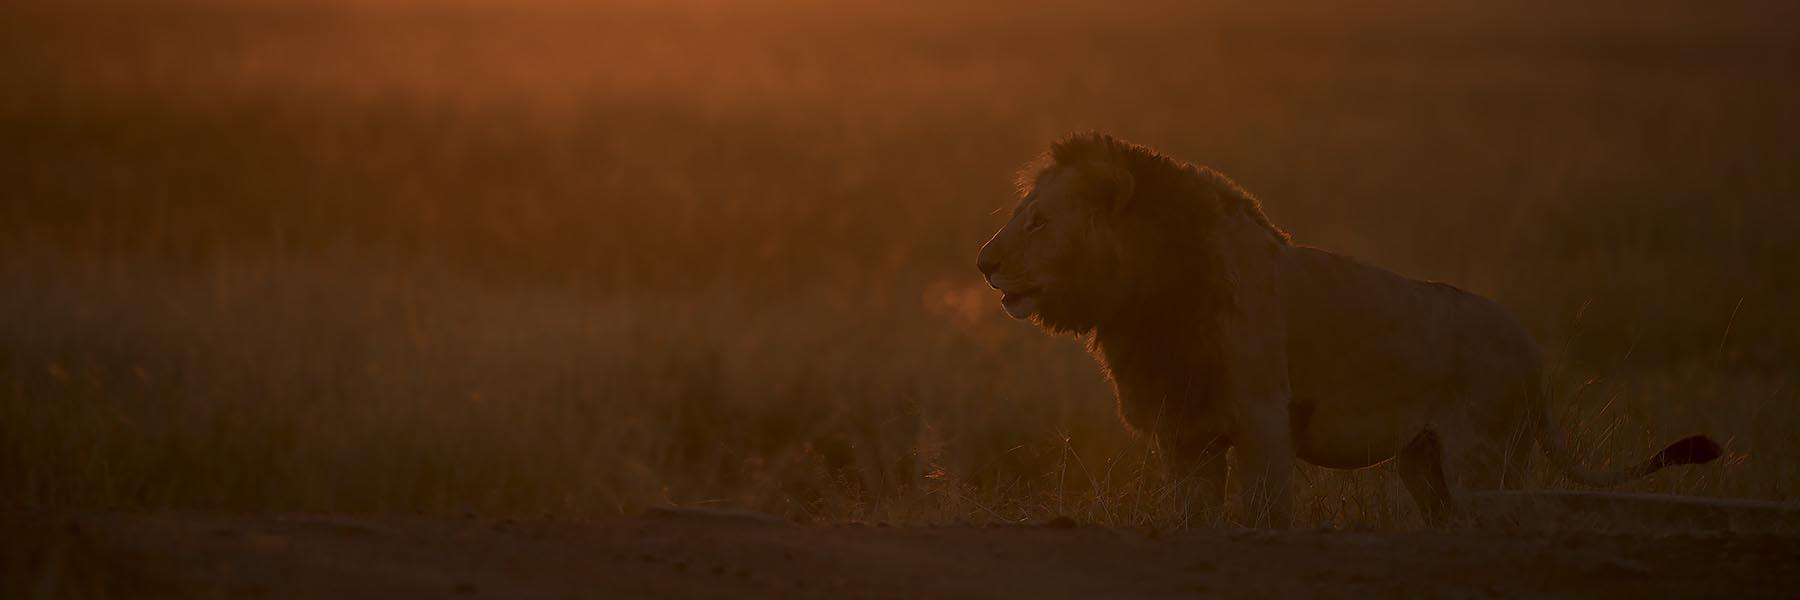 Lion safari in africa